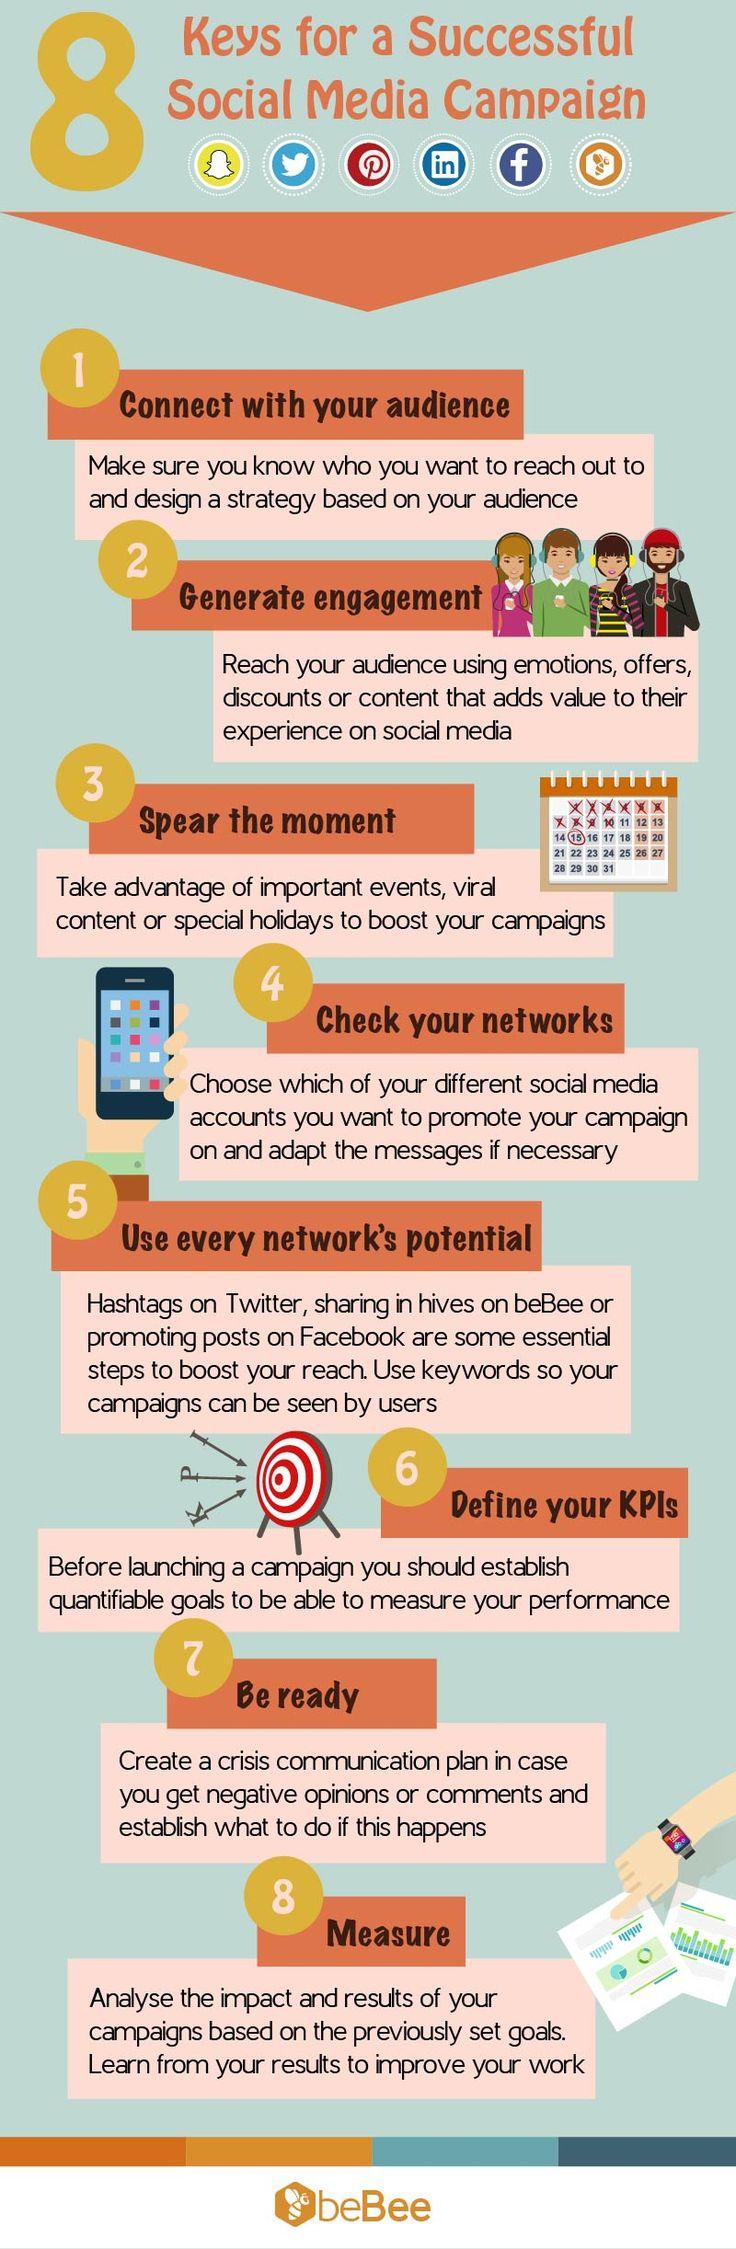 8 keys for a successful social media campaign #Infographic #SocialNetworks #SocialMedia